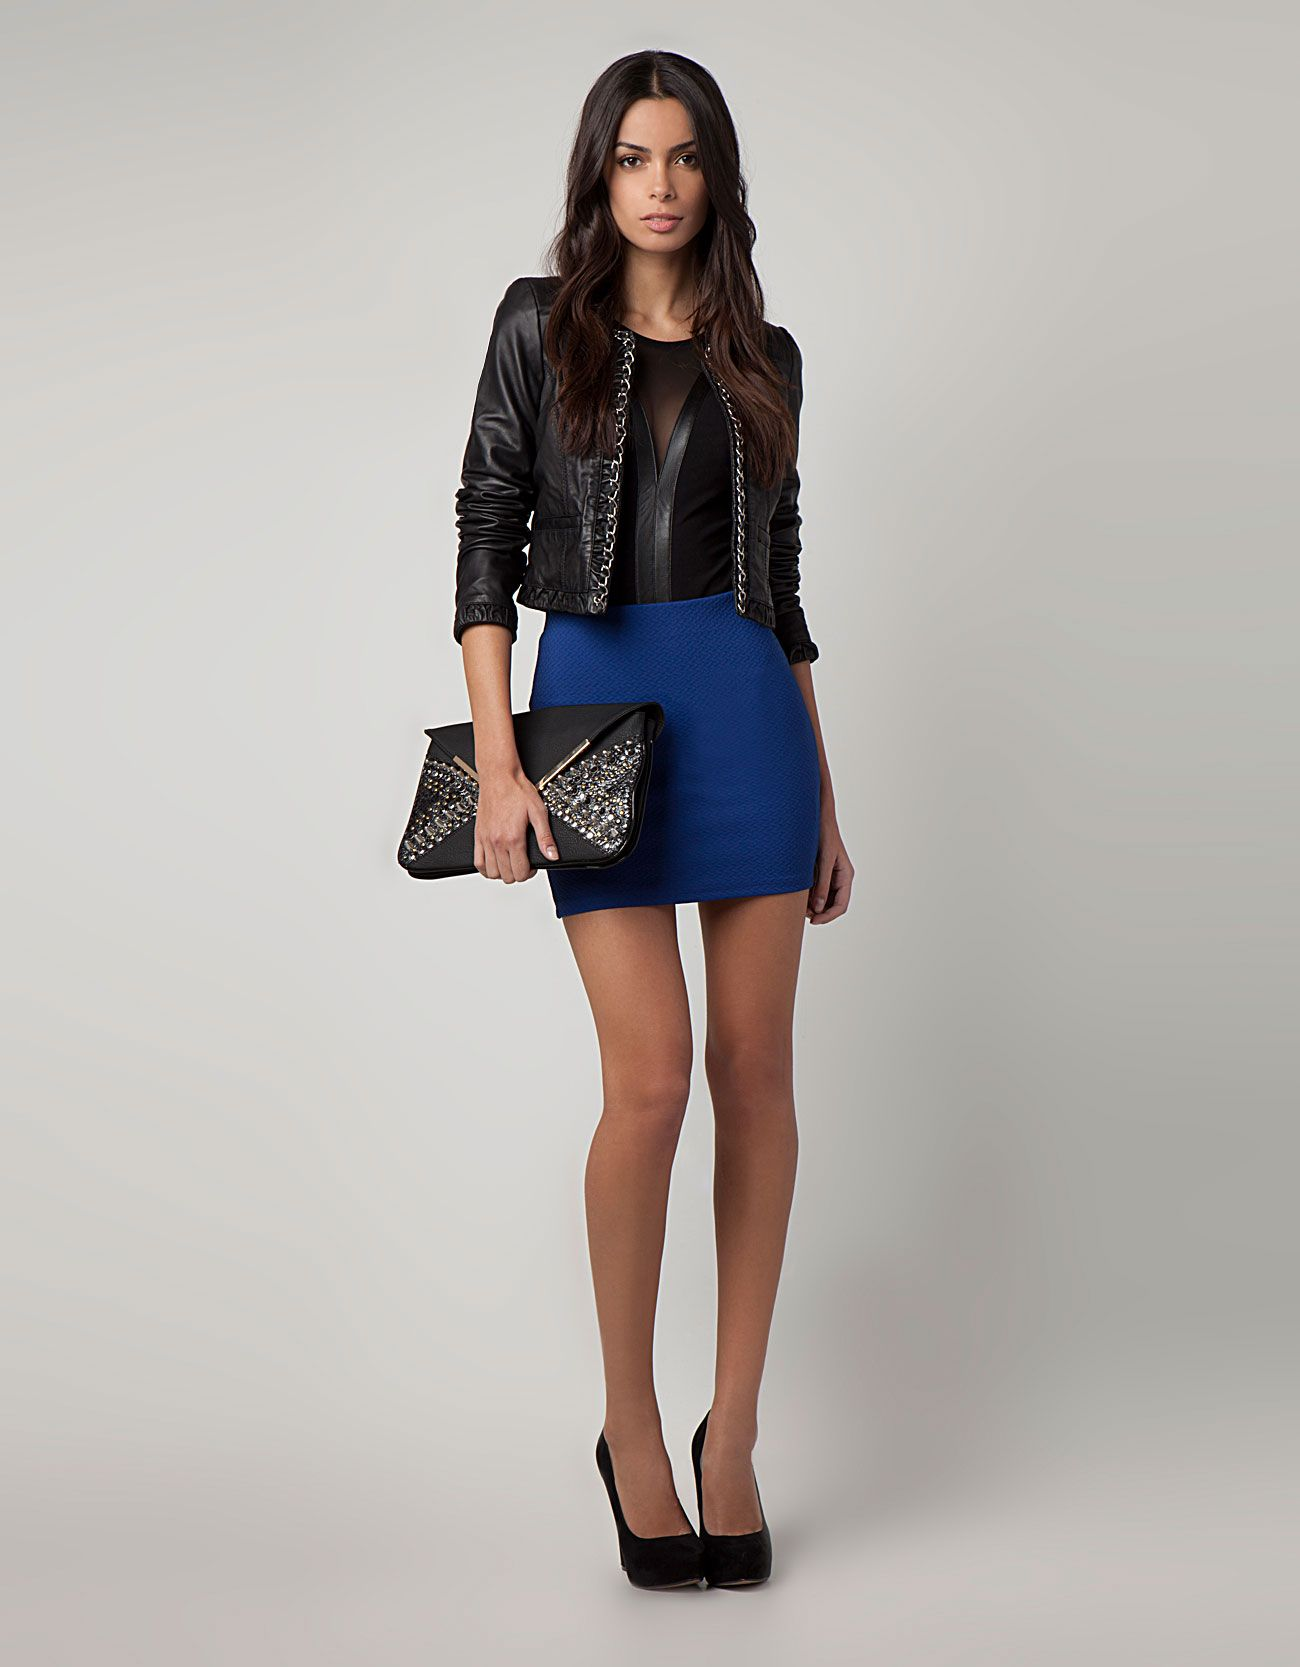 Falda azul electrico | Moda | Pinterest